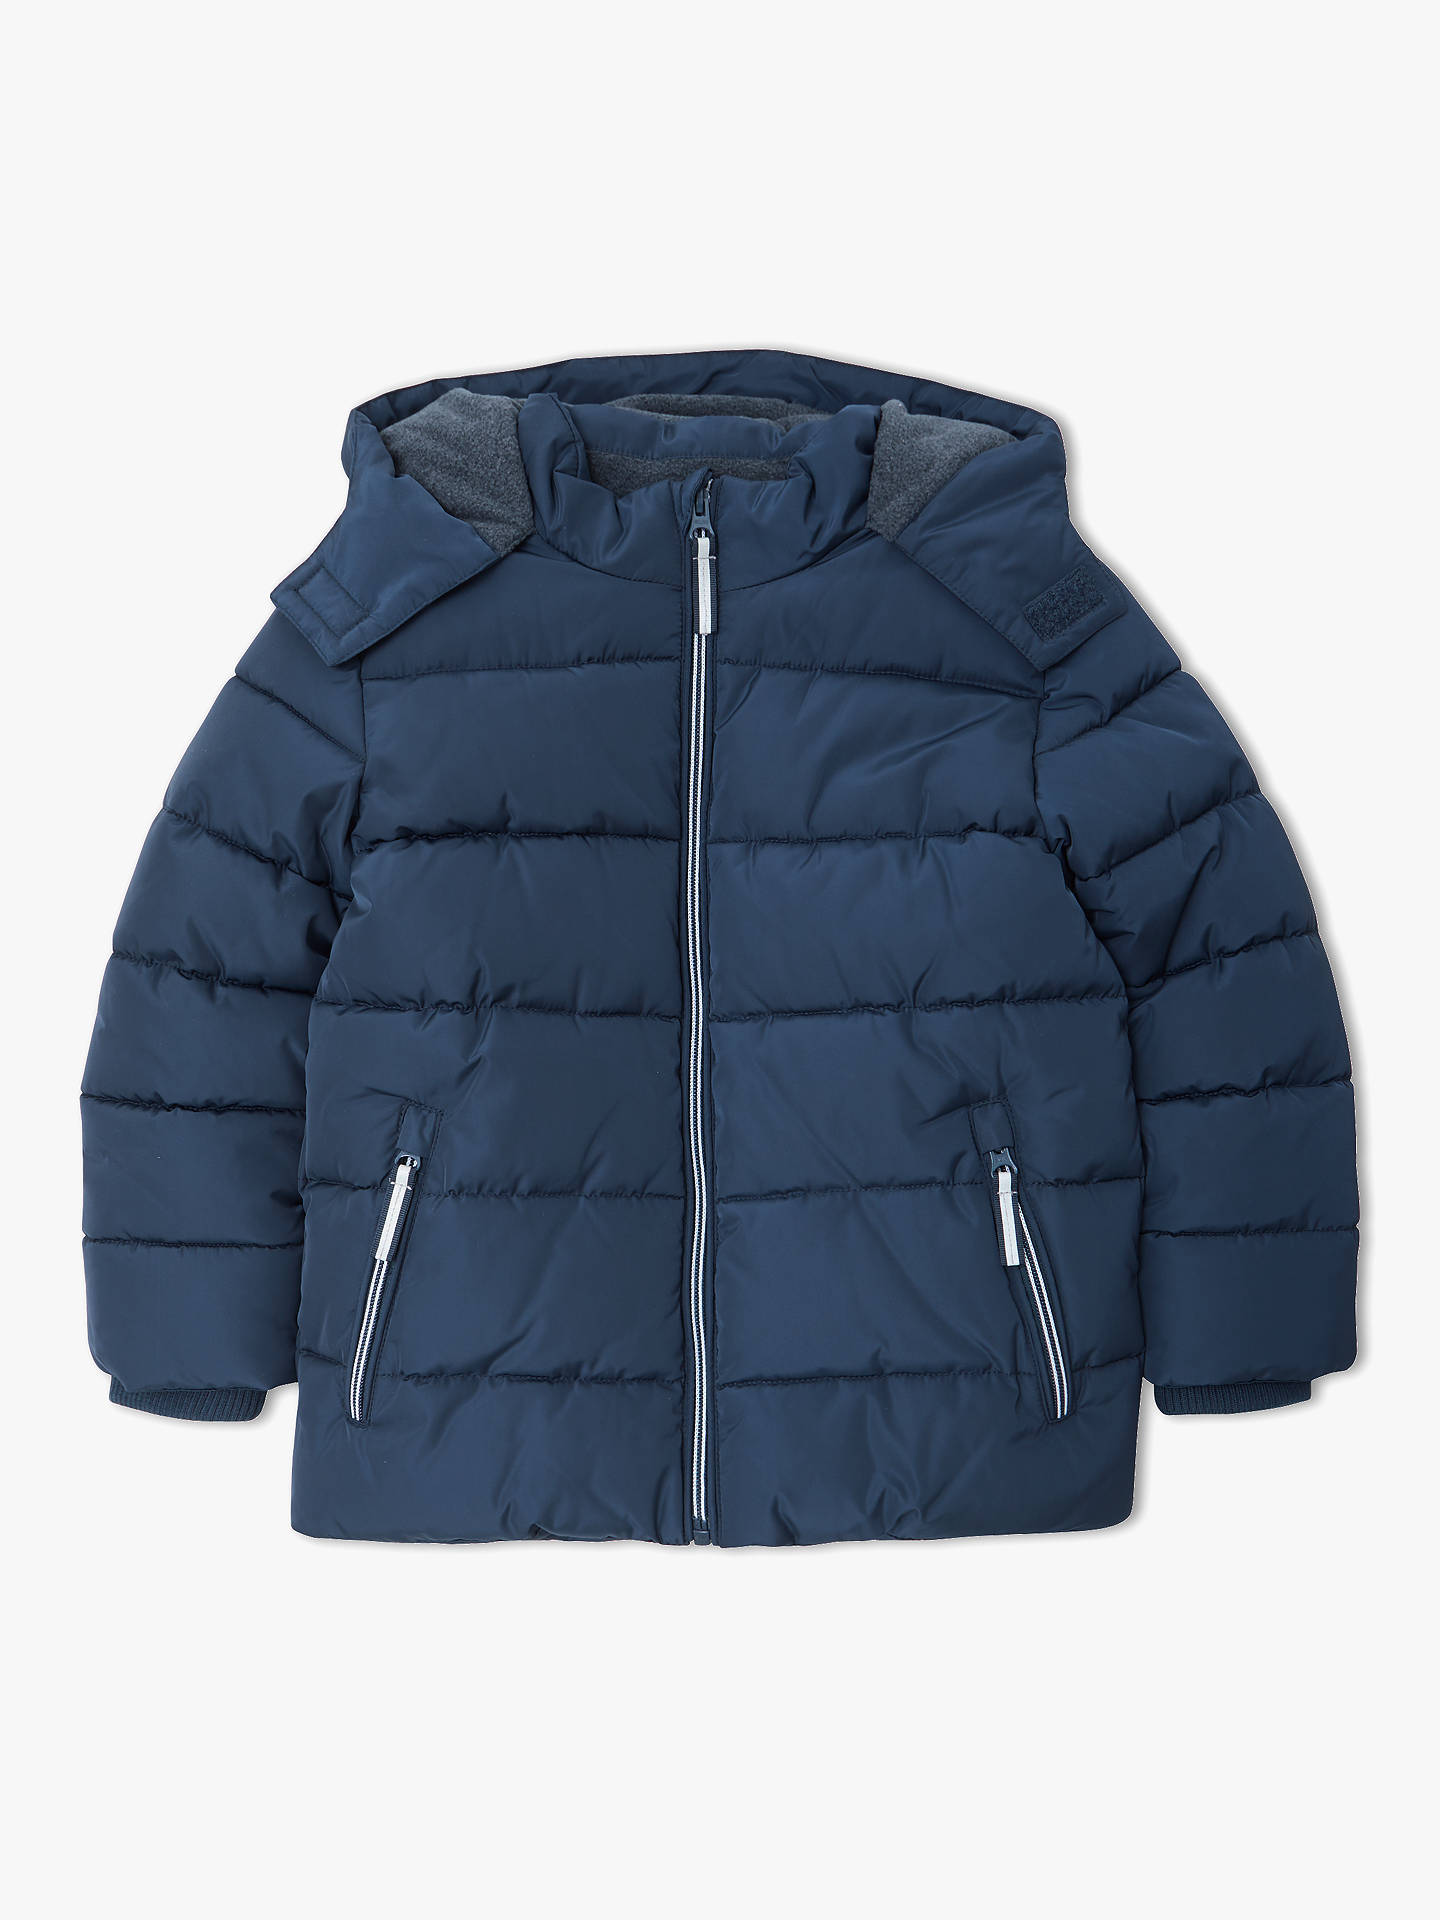 7a814cfd1227 John Lewis   Partners Boys  Padded Jacket